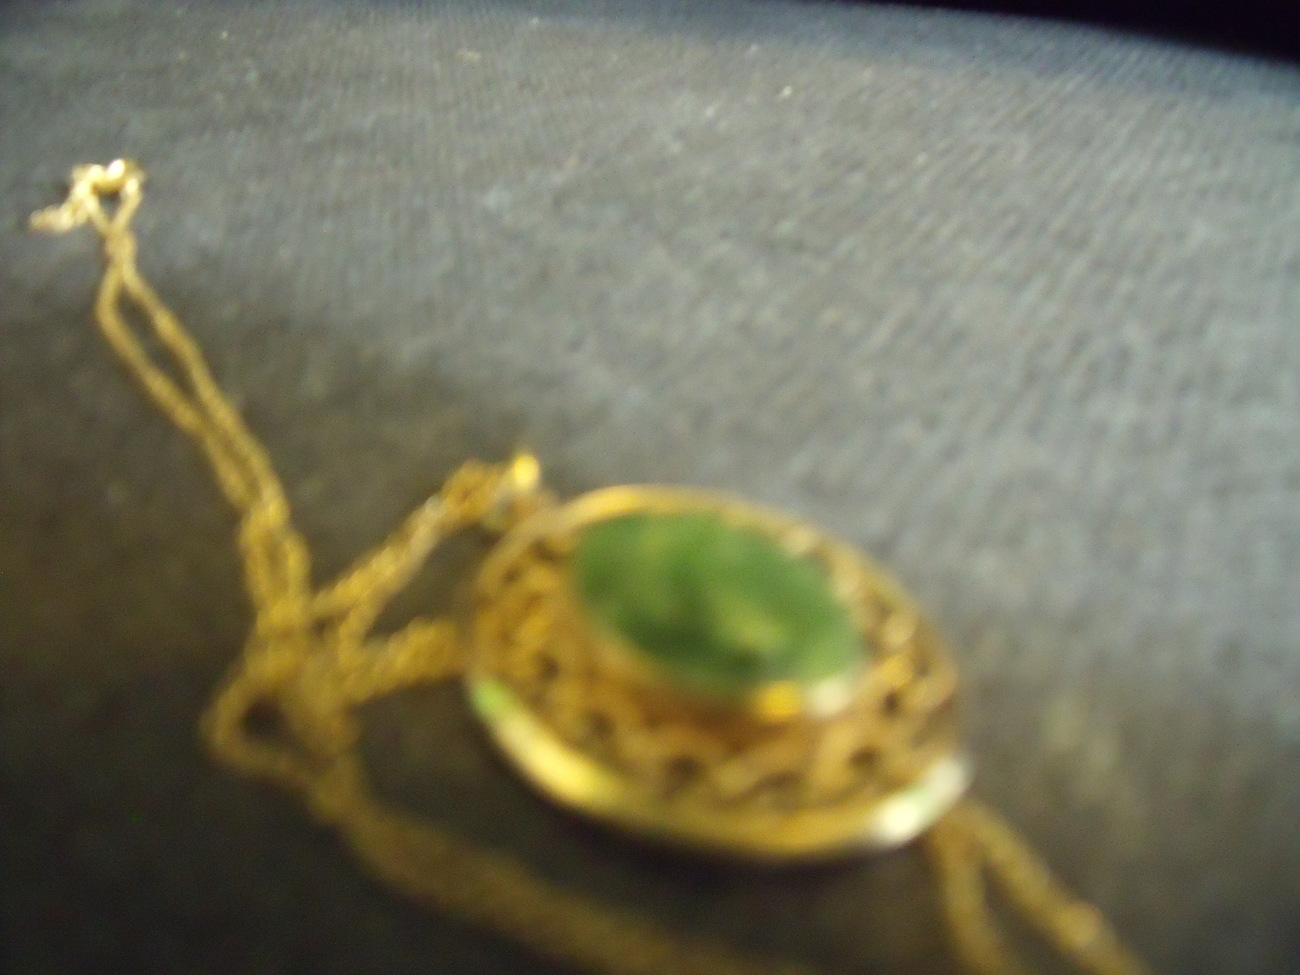 Vintage 12K GF Dainty Jade Pendant and Chain